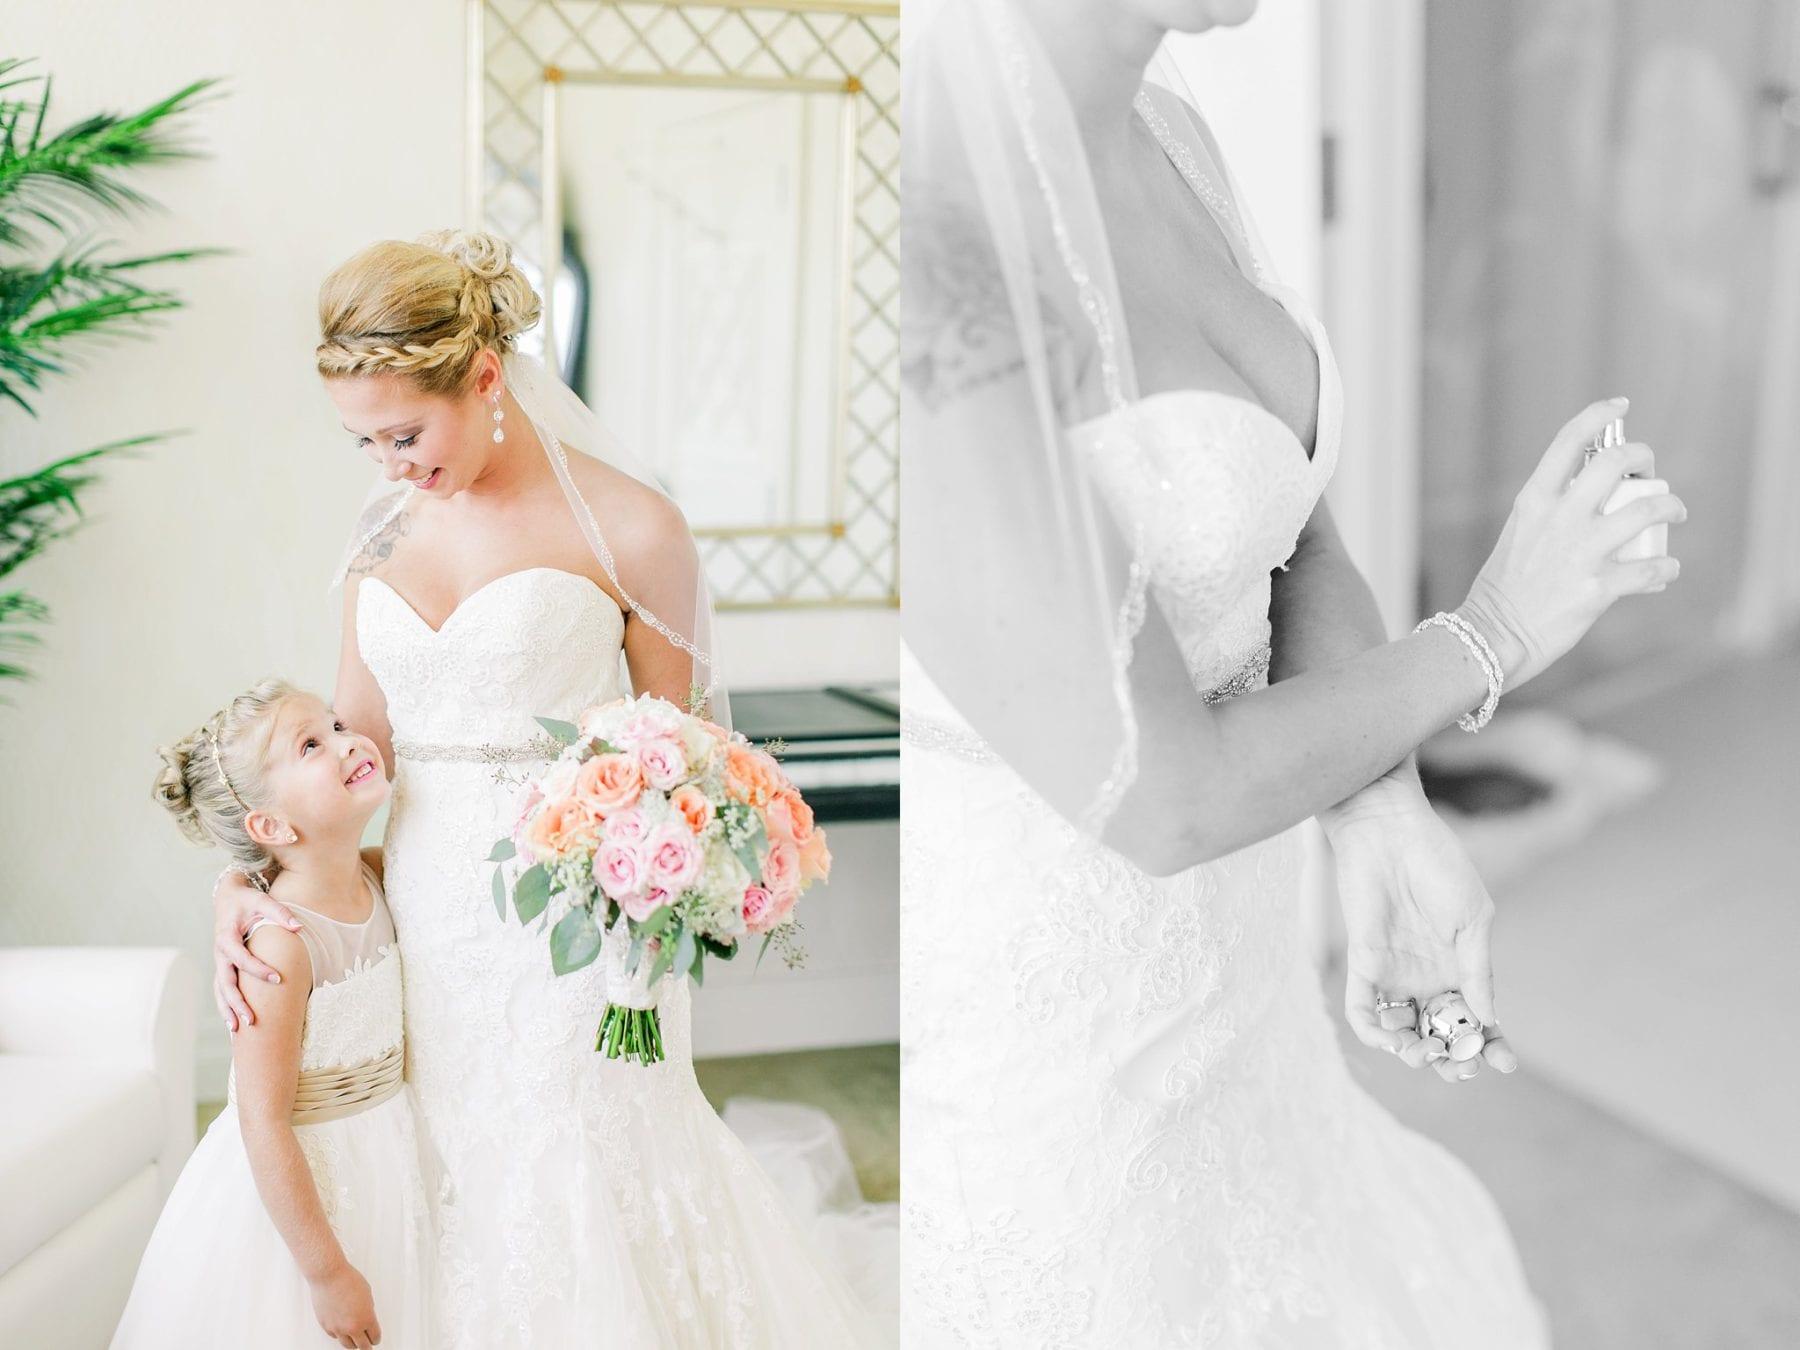 Waters Edge Wedding Photos Maryland Wedding Photographer Megan Kelsey Photography Katie & Conor-109.JPG